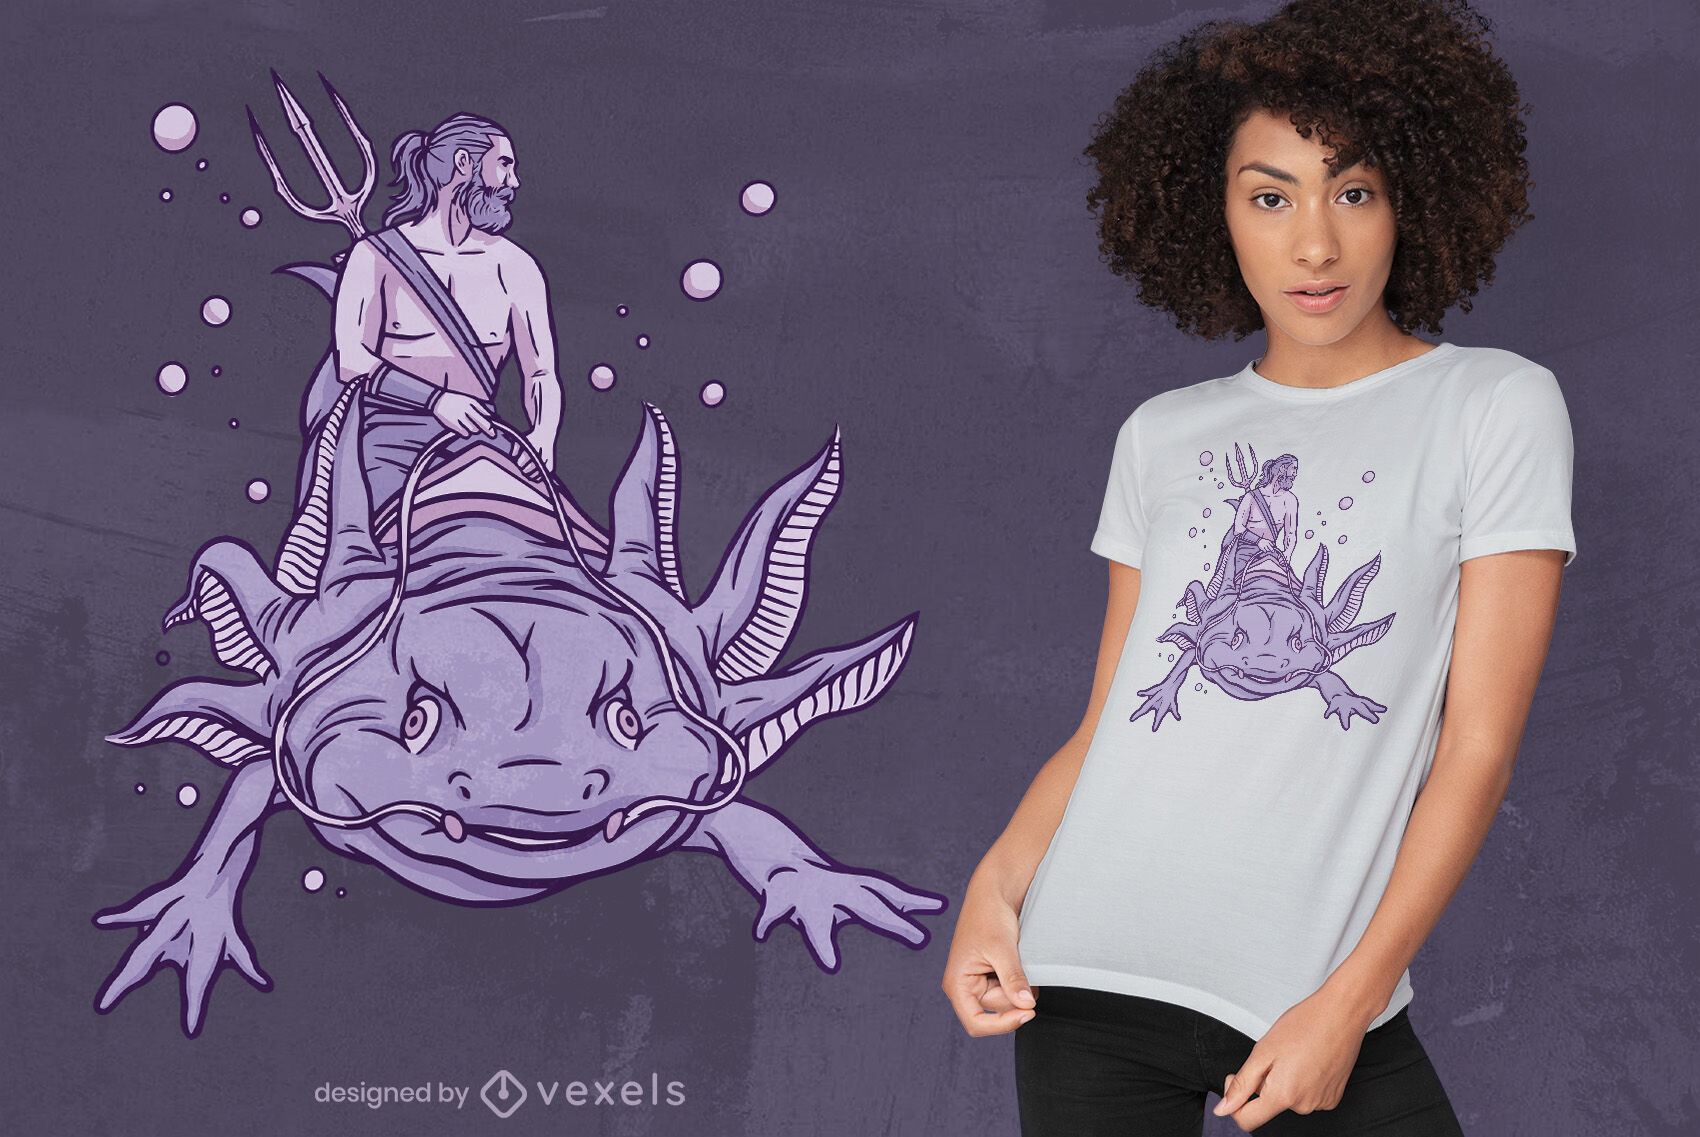 Poseidon in axolotl t-shirt design